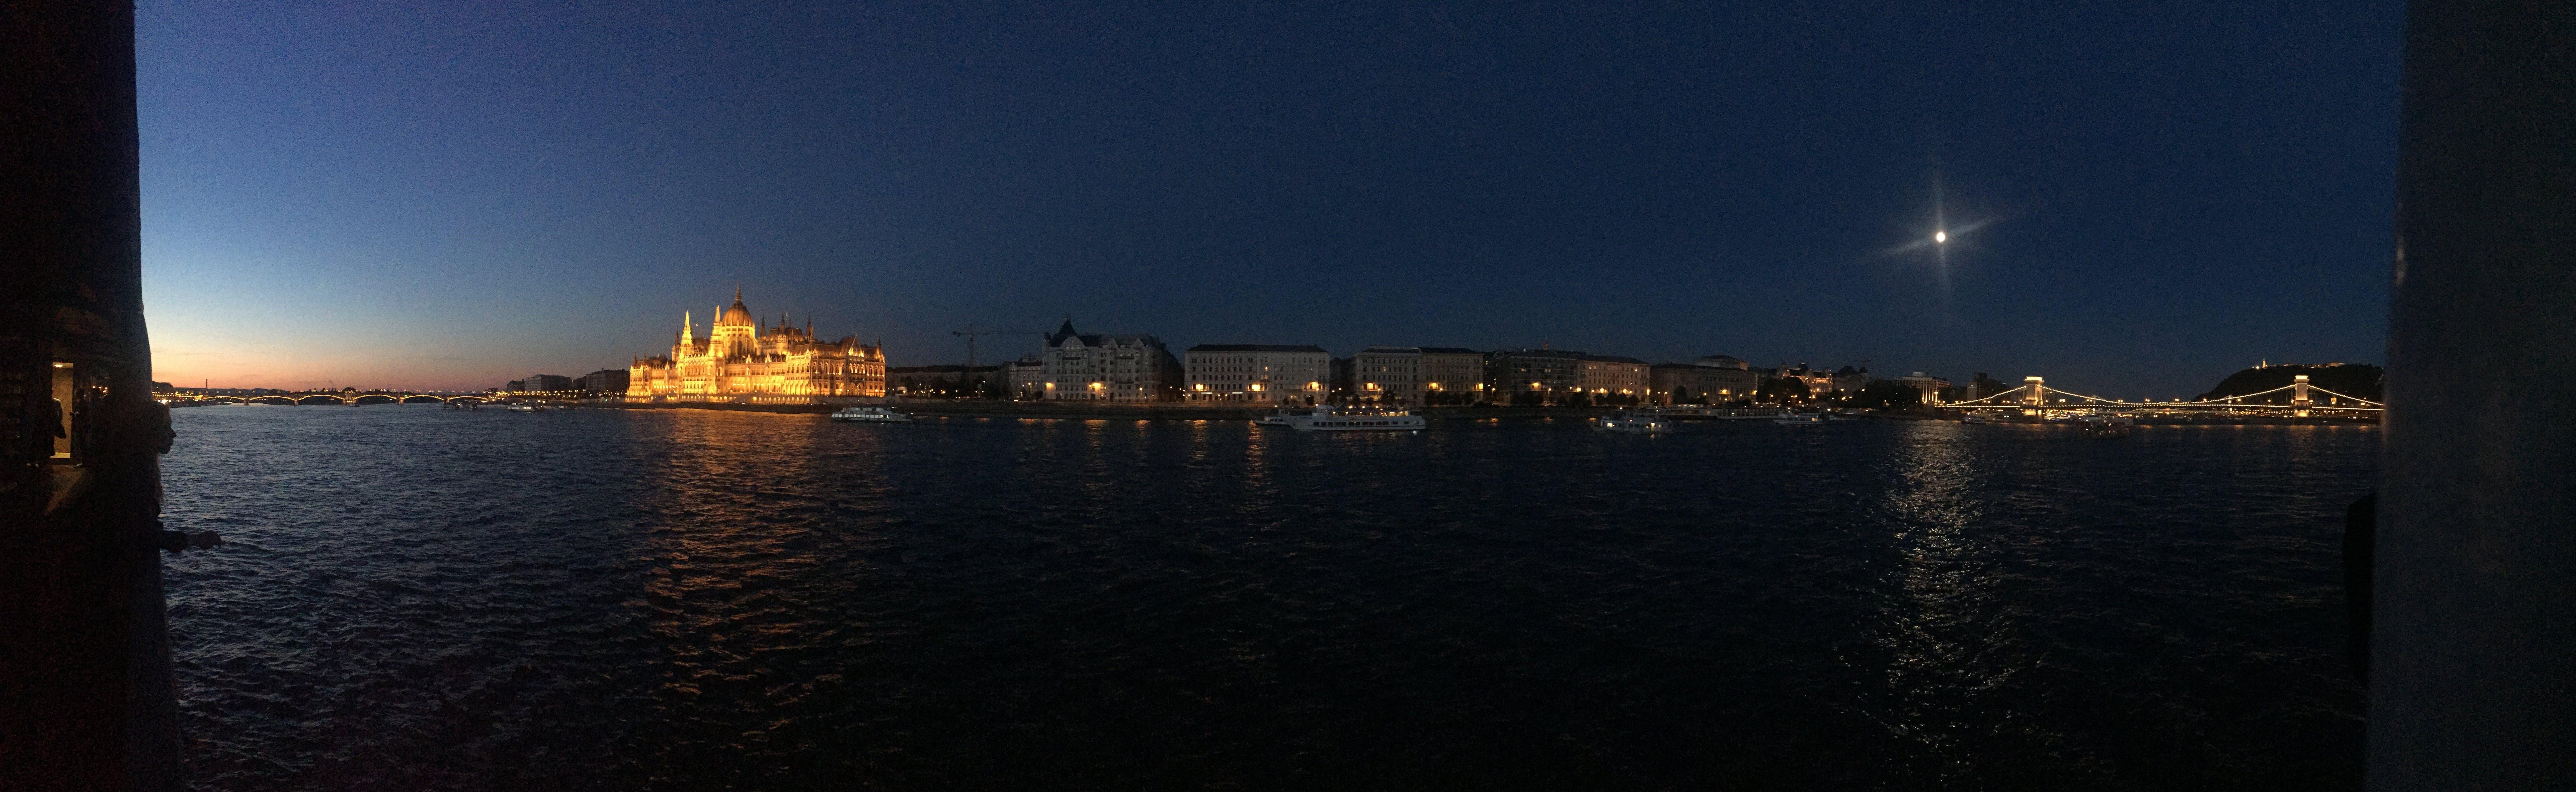 Free stock photo of night, bridge, river, moon